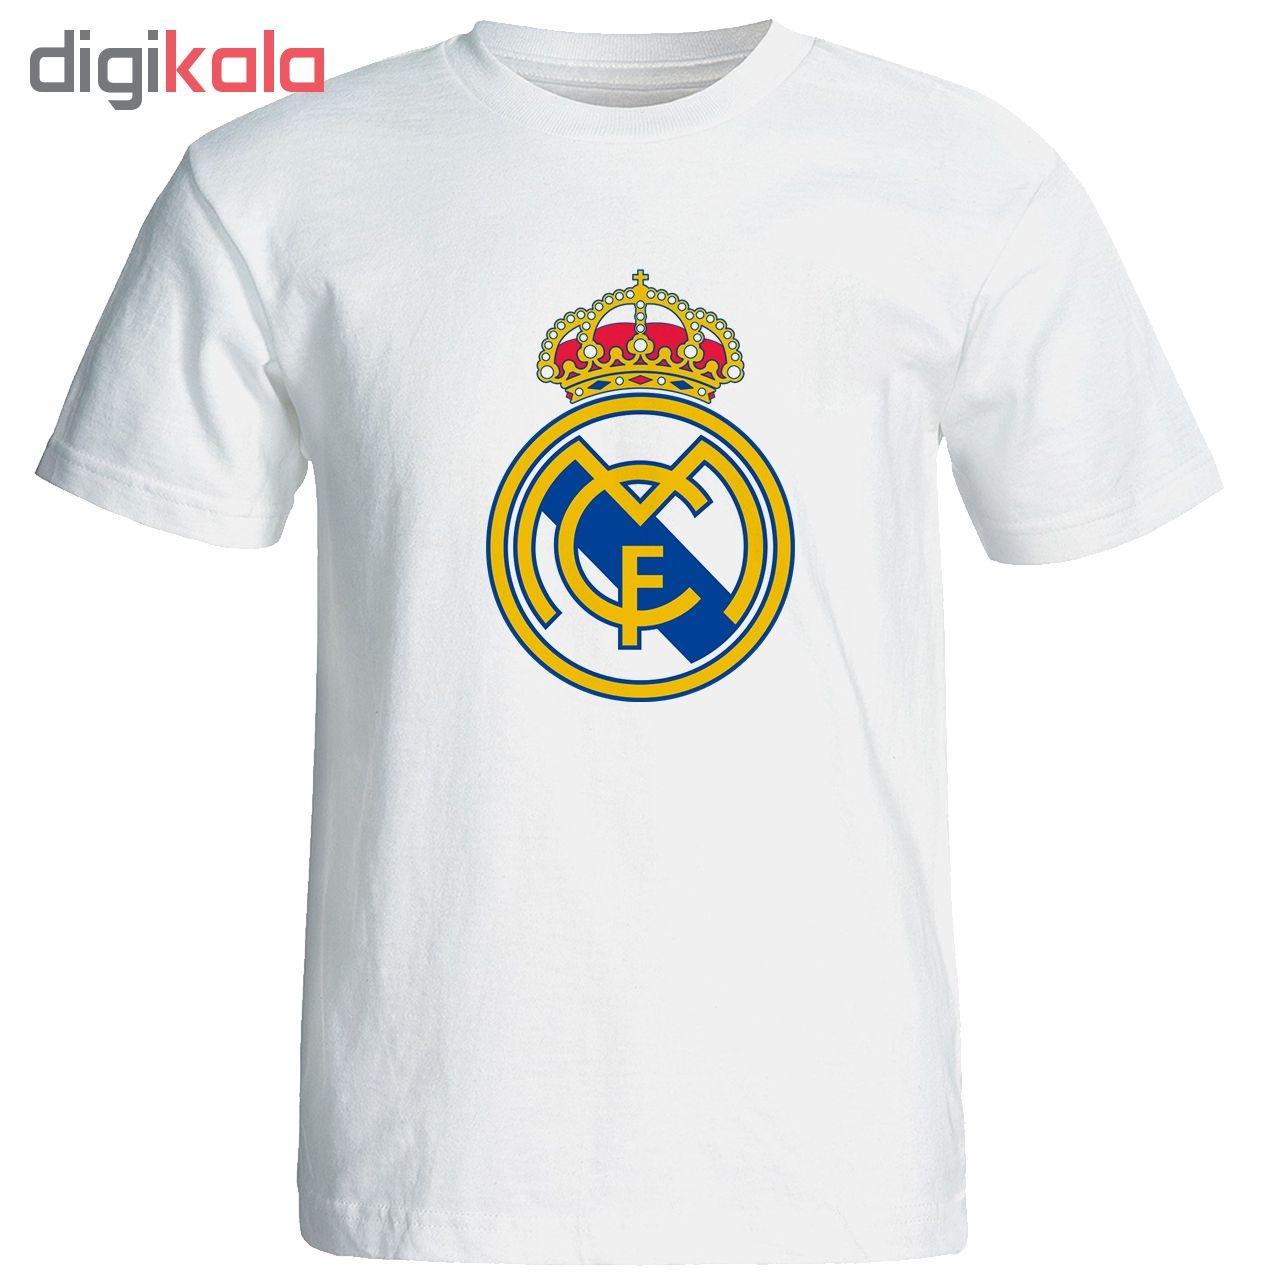 تیشرت آستین کوتاه مردانه طرح رئال مادرید کد 9333 main 1 1